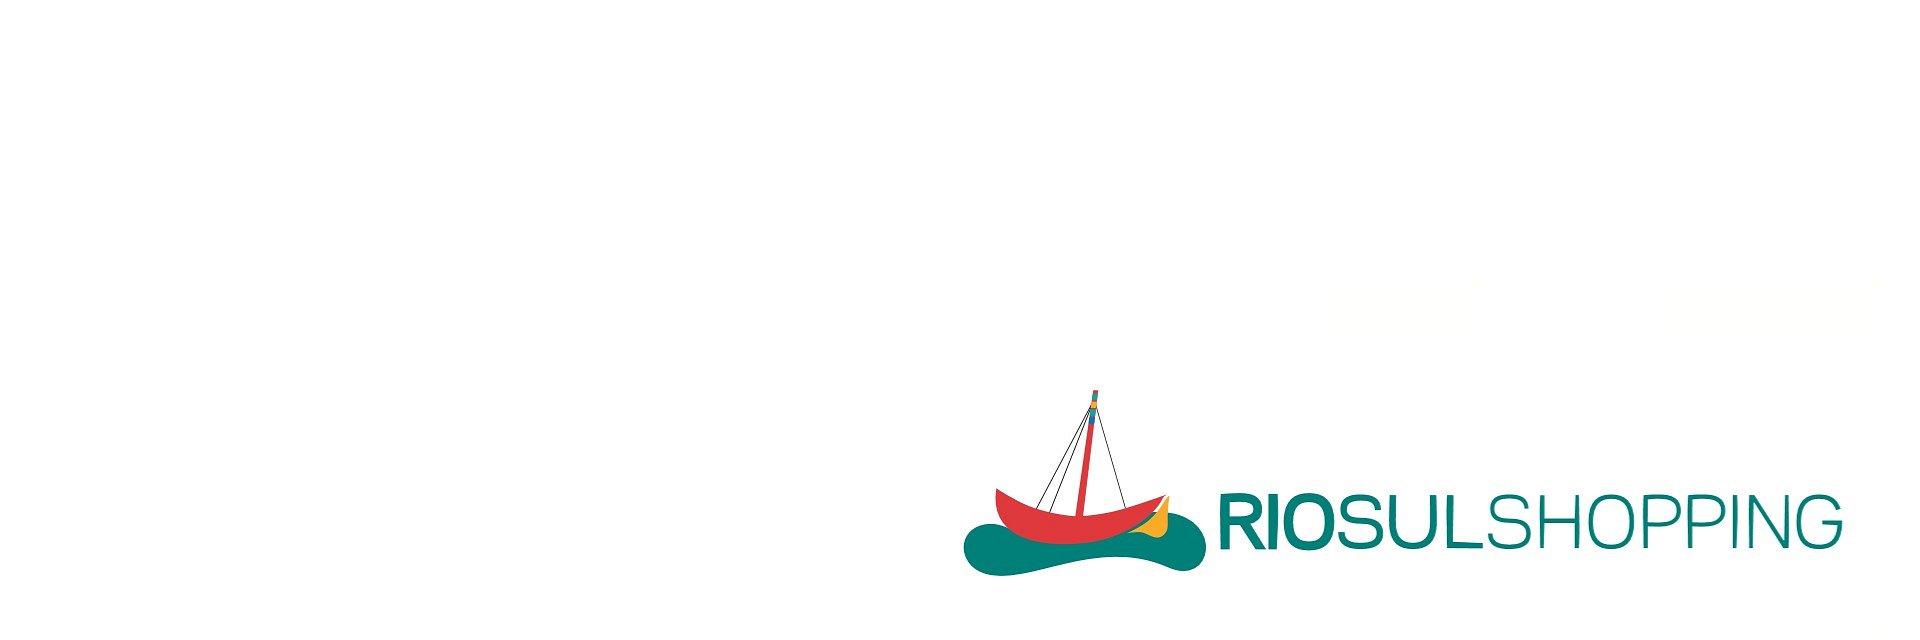 O cinema infantil gratuito está de volta ao RioSul Shopping